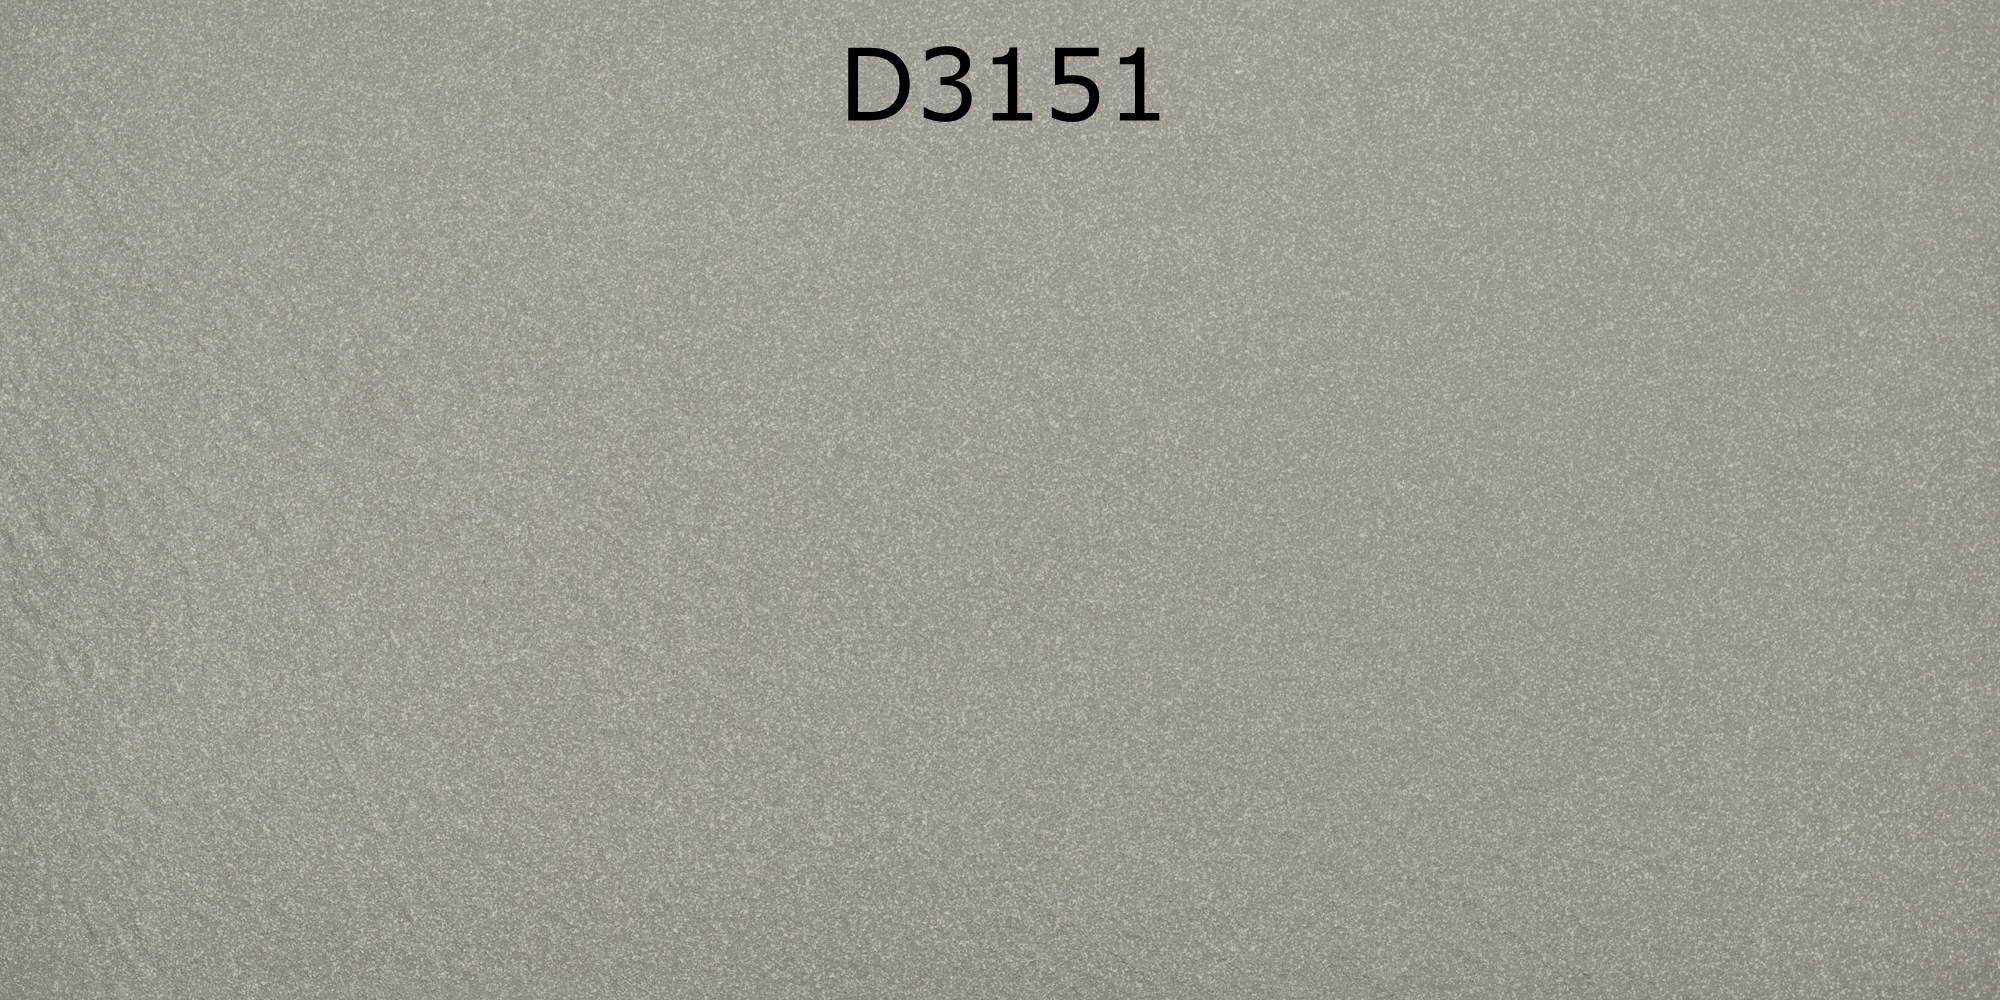 D3151